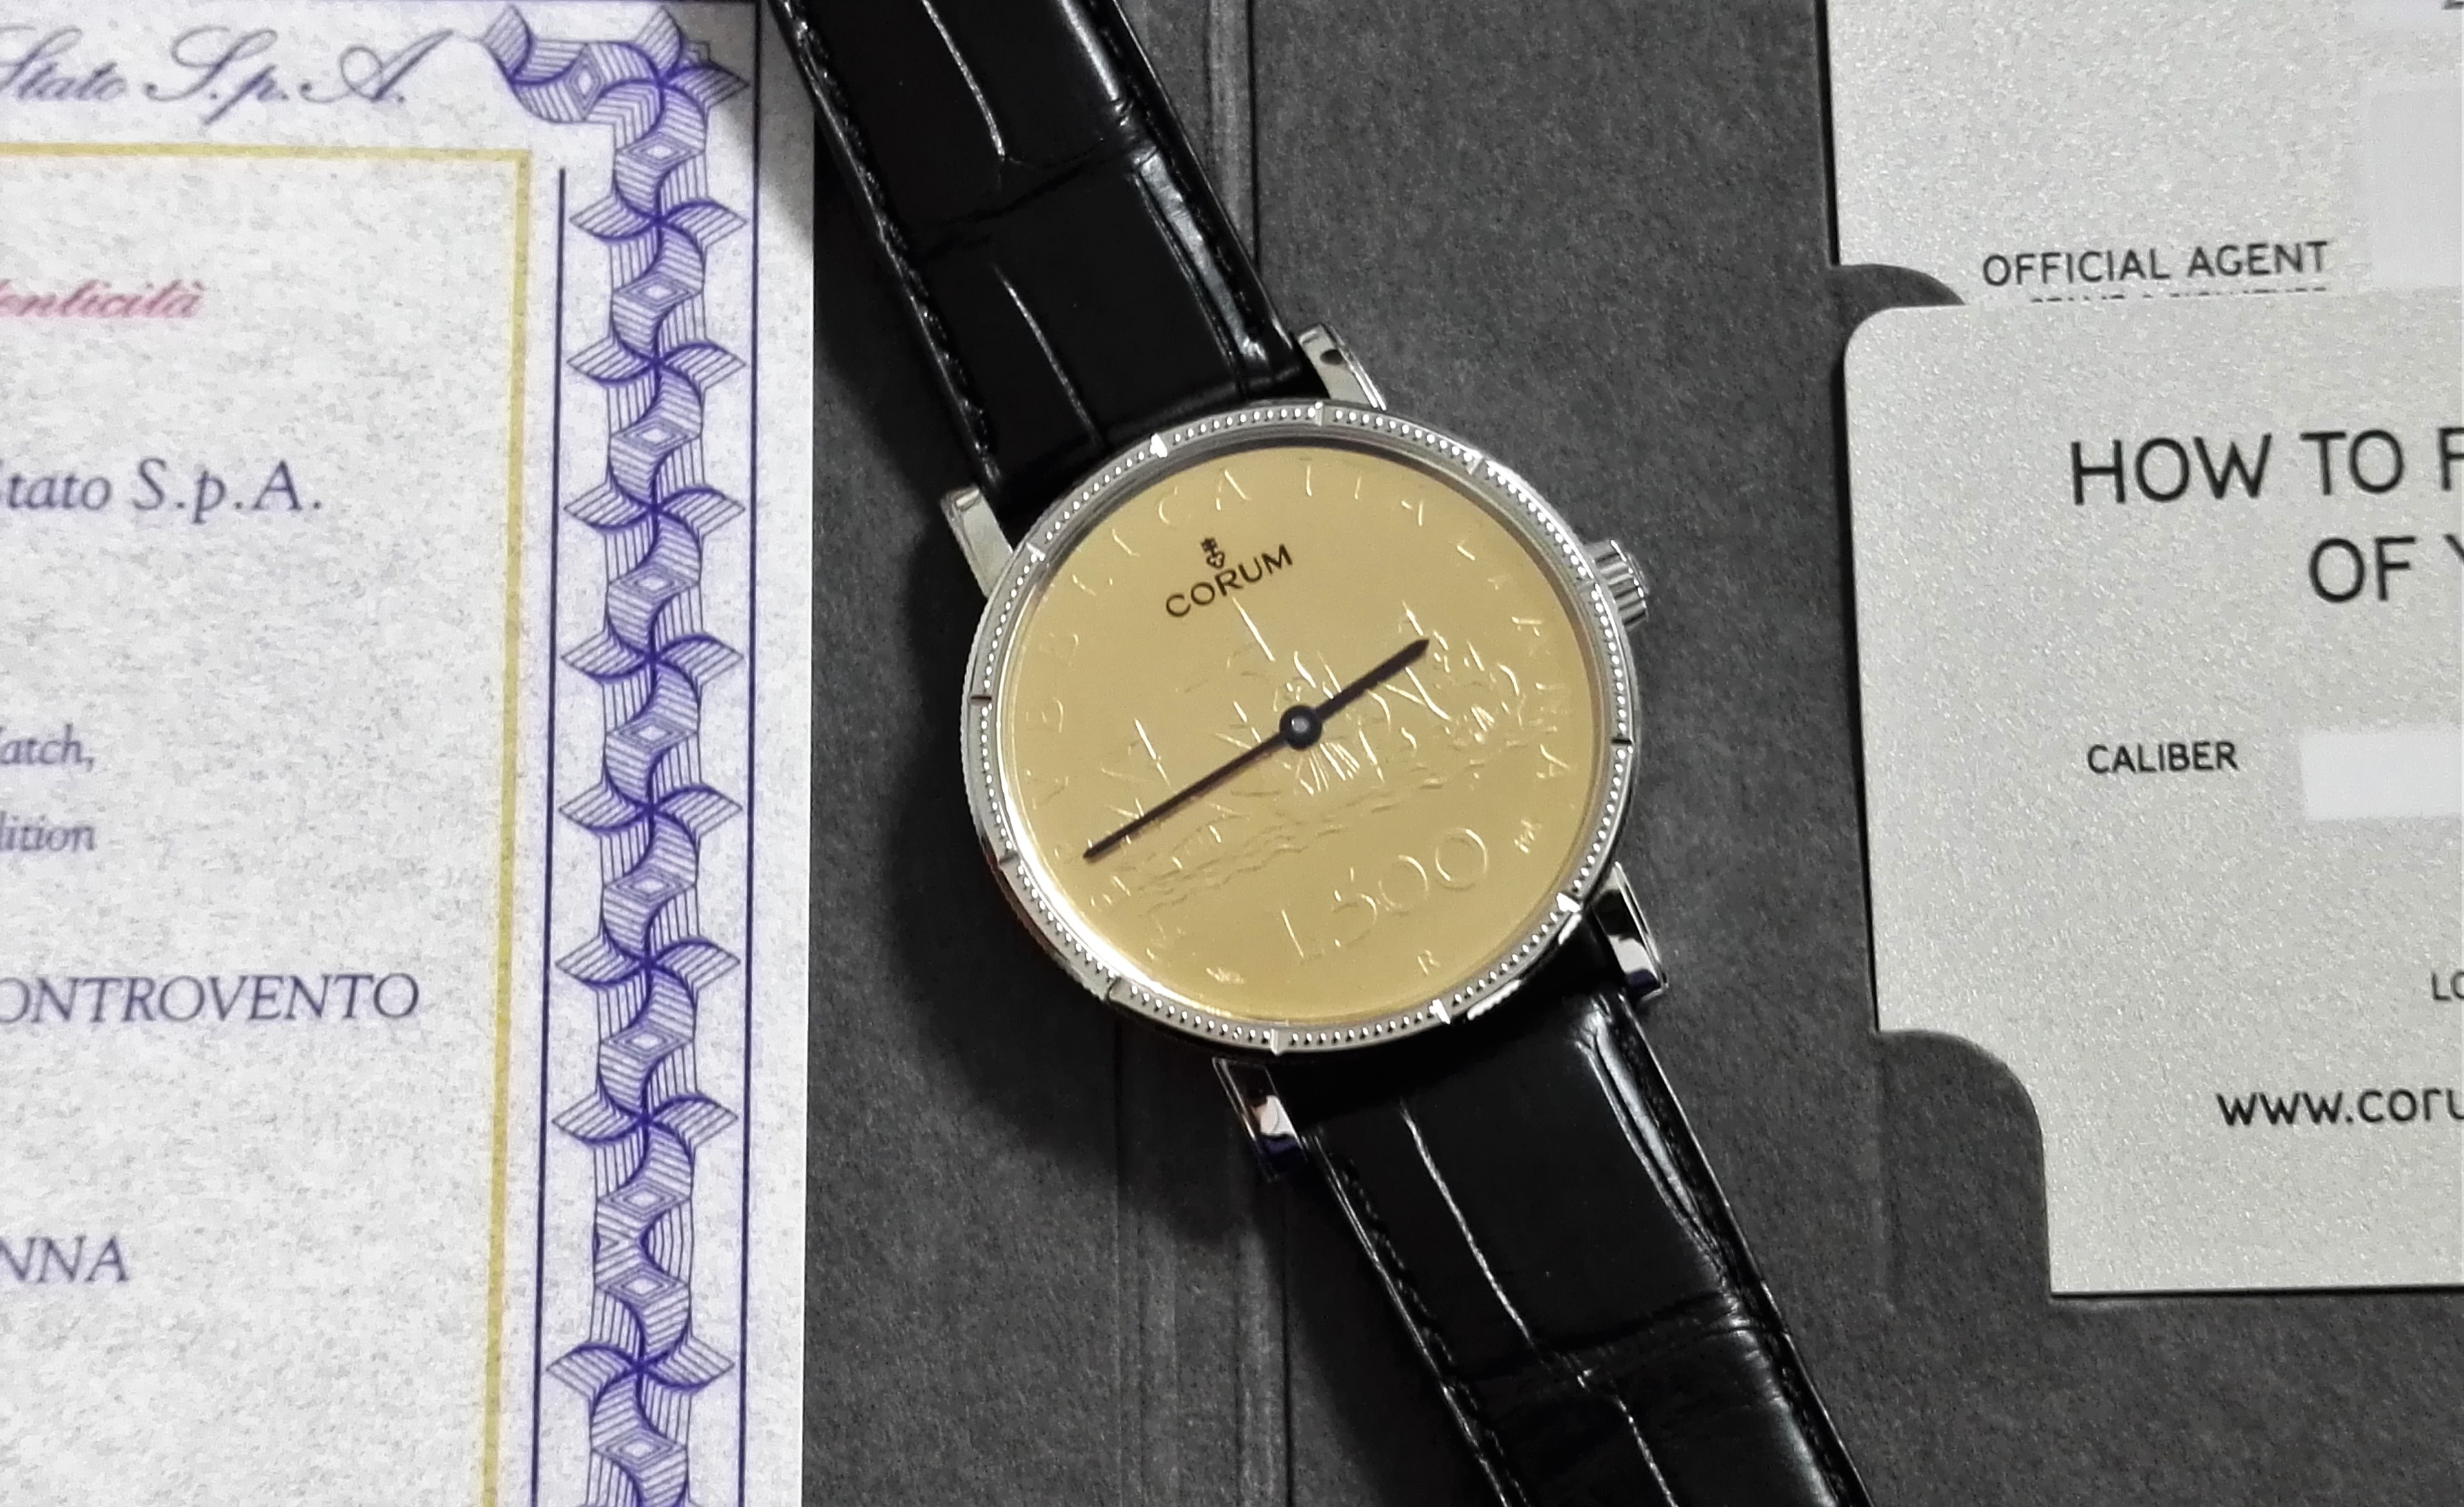 Corum Artisan Coin Watch 500 lire Steel/18 kt Gold Caravelle New | San Giorgio a Cremano